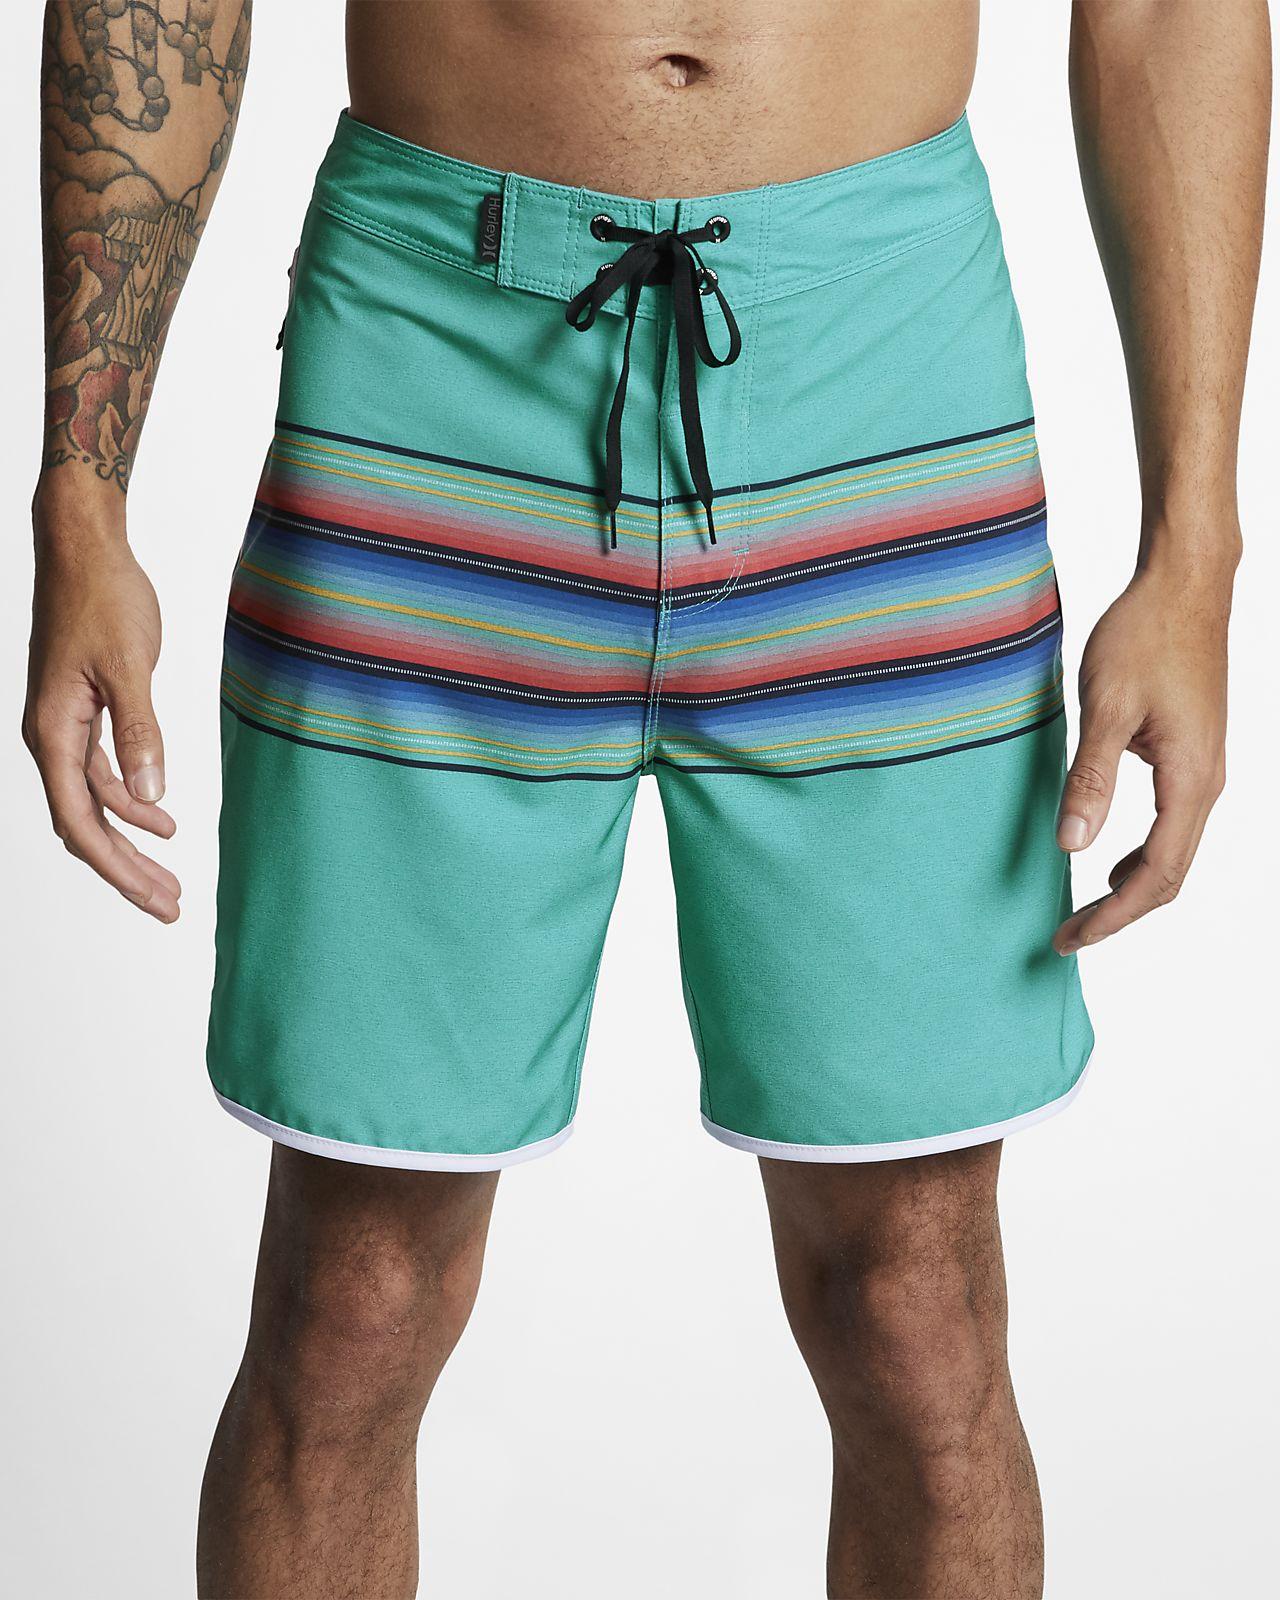 Shorts de playa de 45 cm para hombre Hurley Phantom Baja Malibu